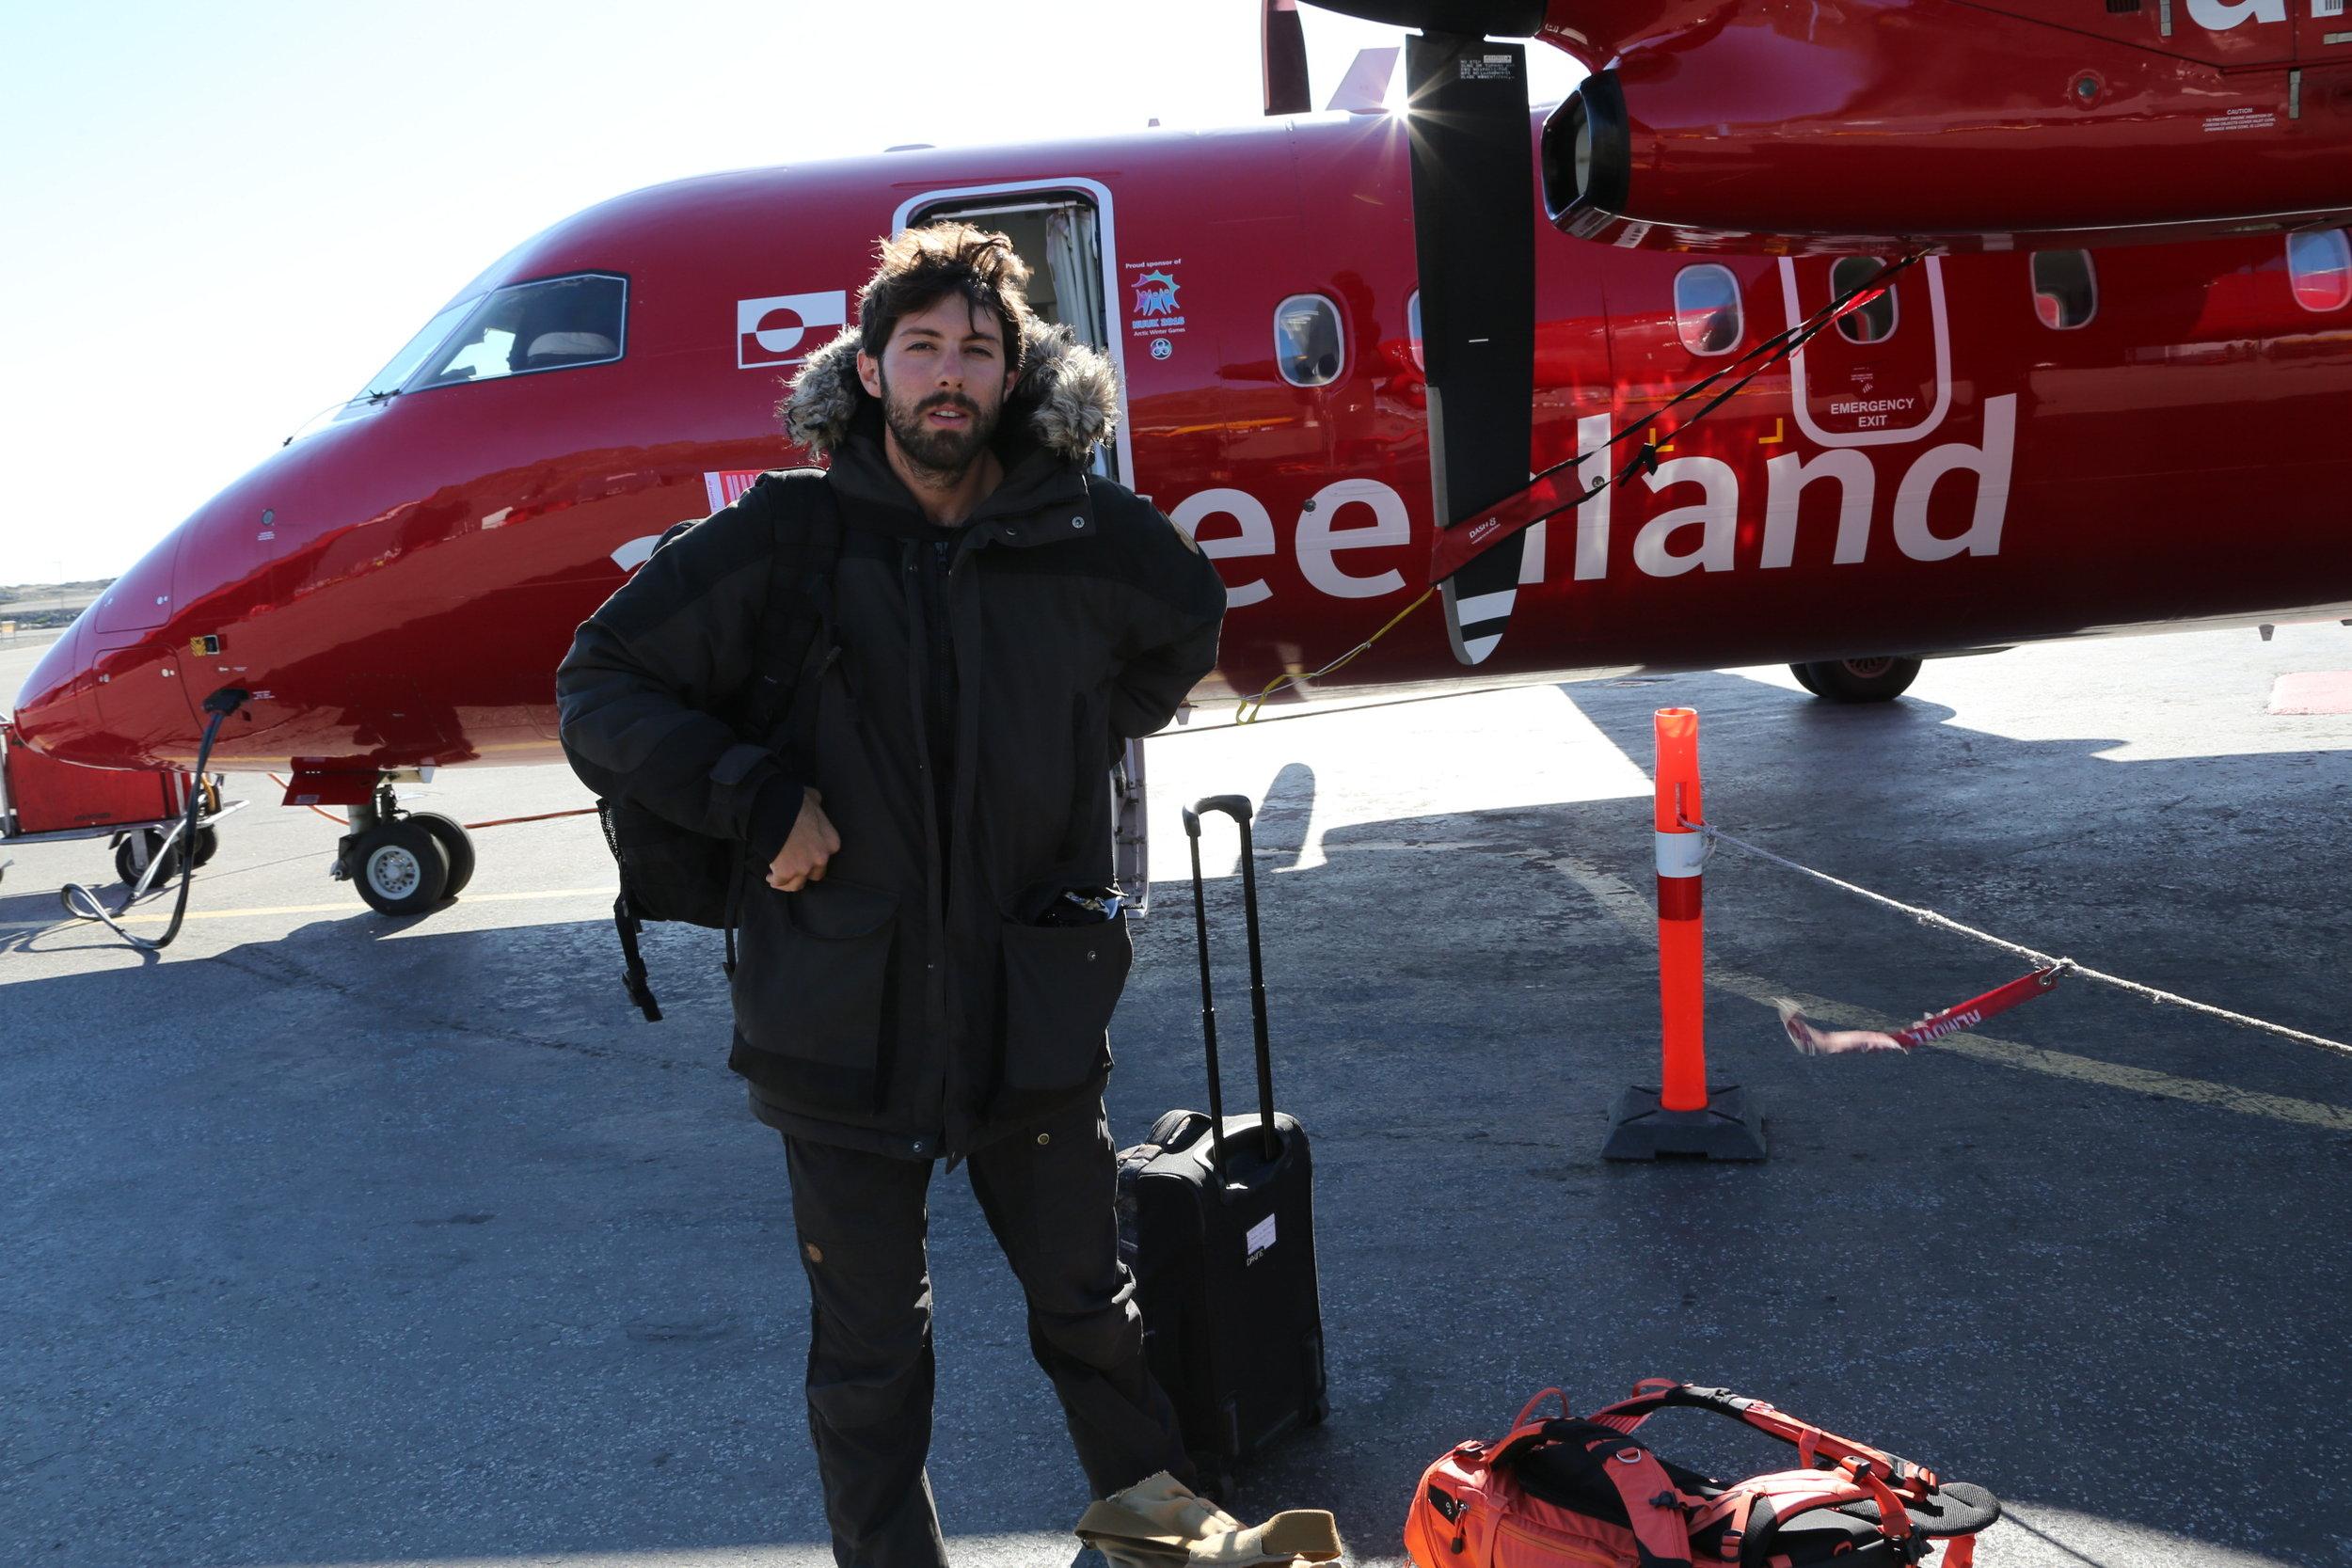 Karim standing besides the Air Greenland Dash-8 plane.